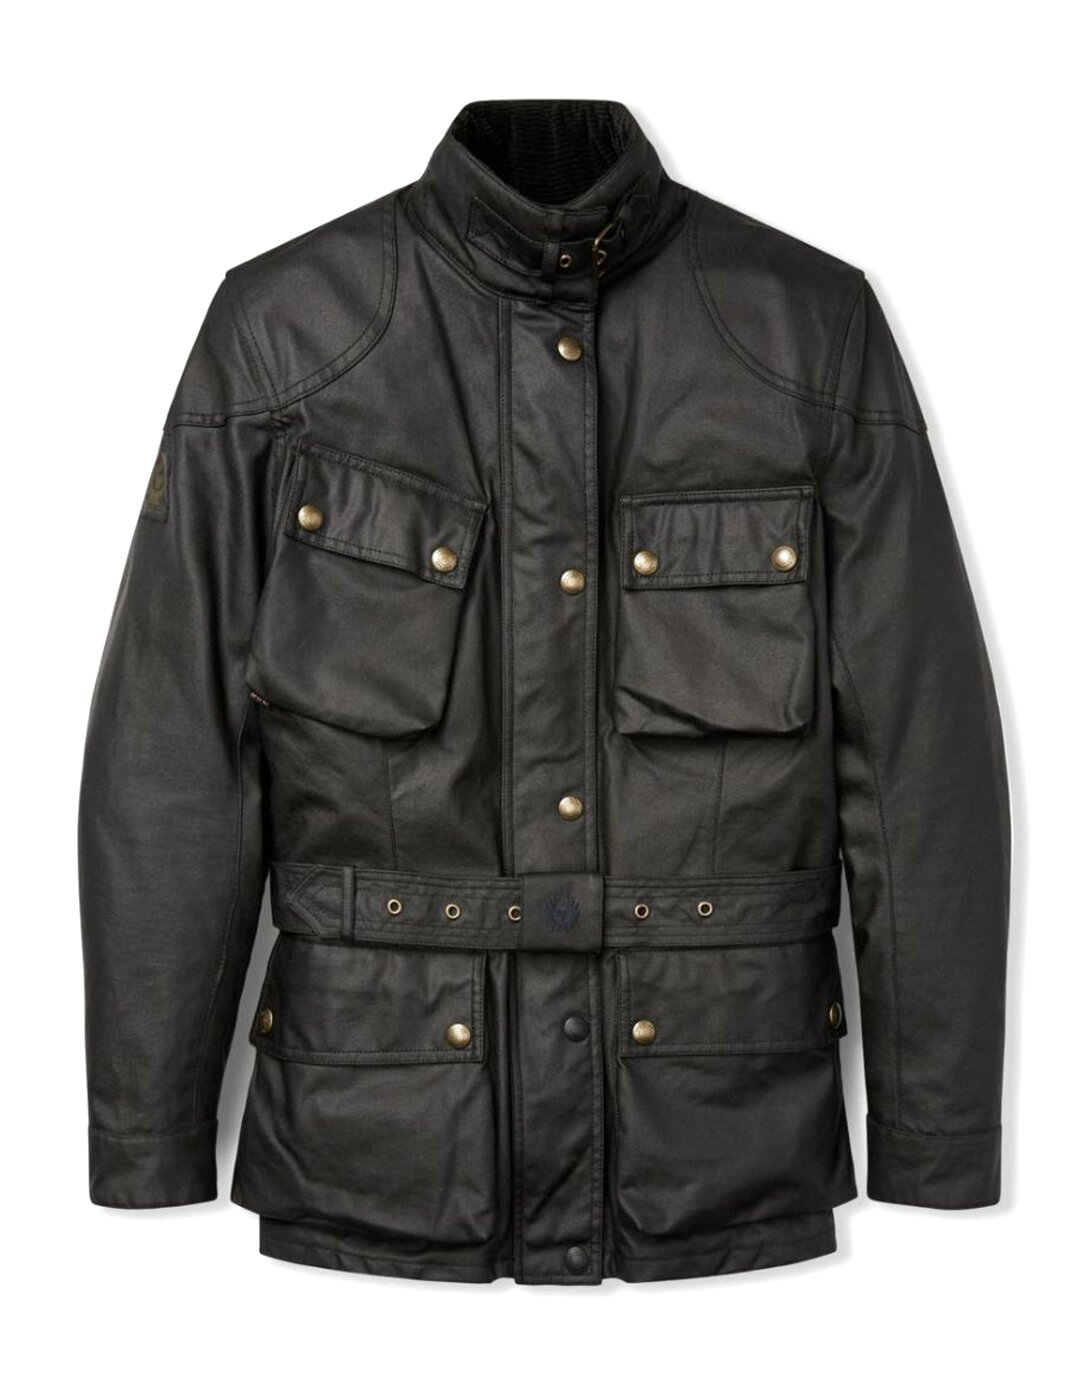 mens belstaff motorcycle jacket for sale